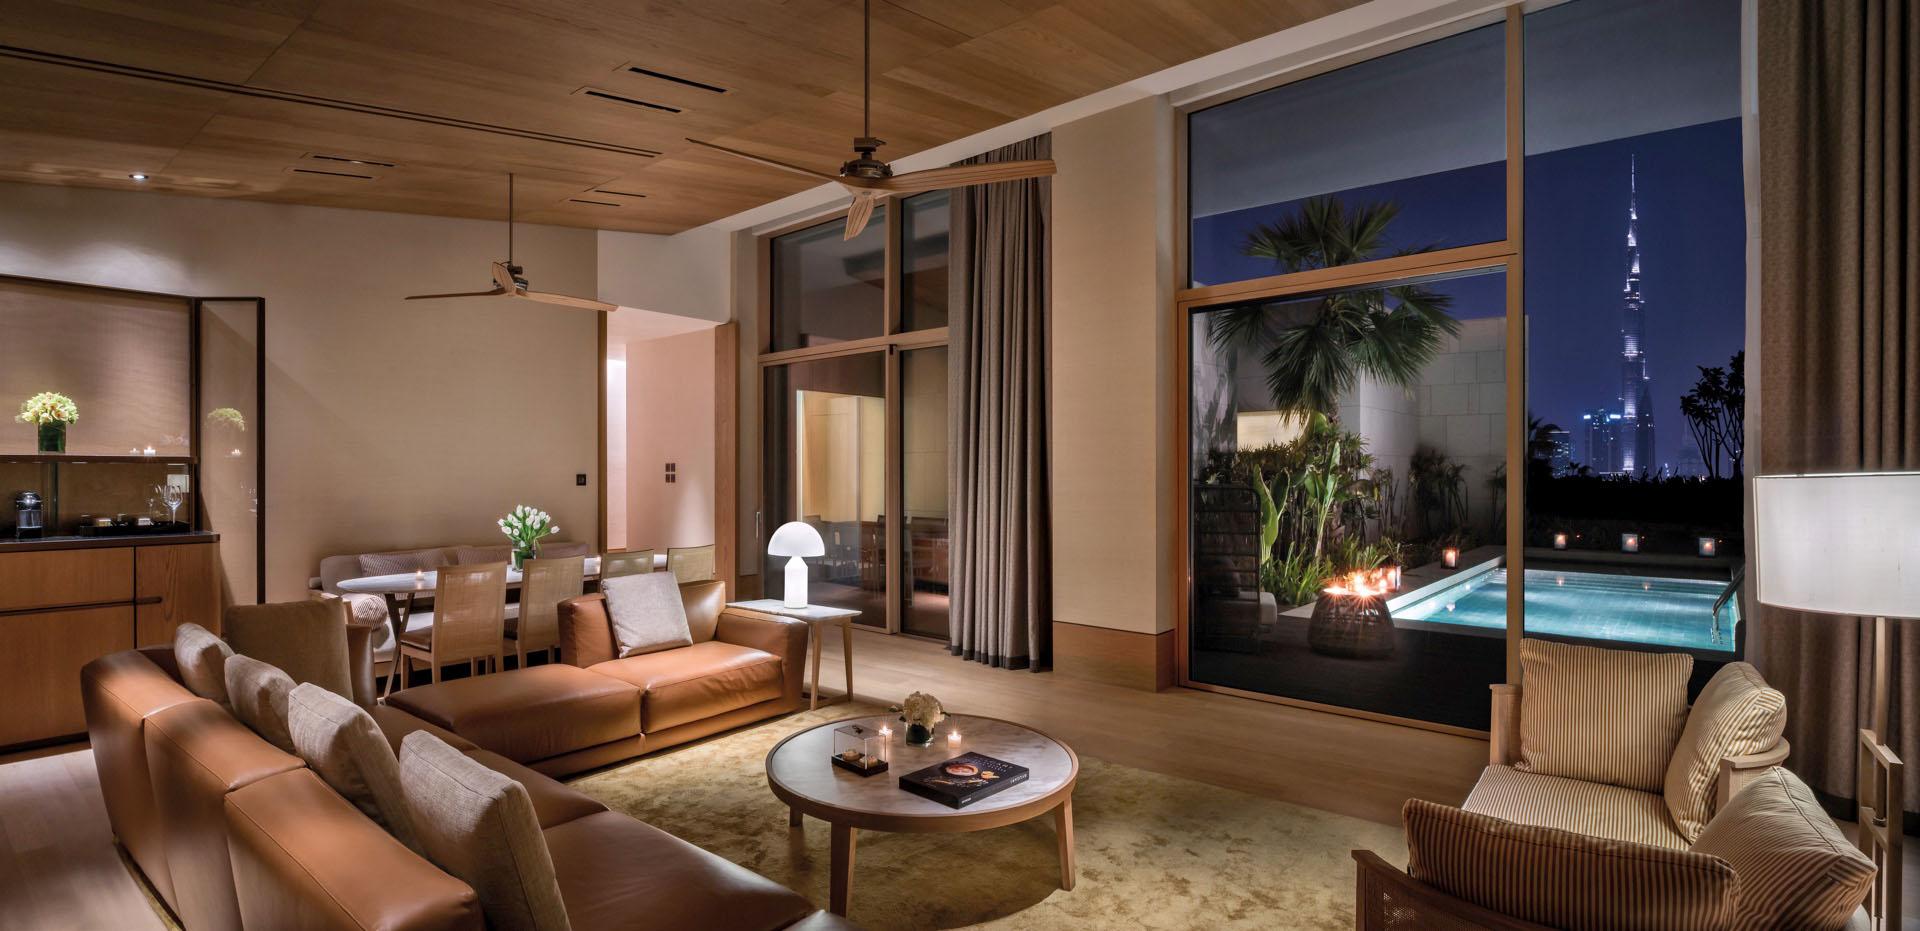 Bvlgari Resort Dubai - Skyline Villa